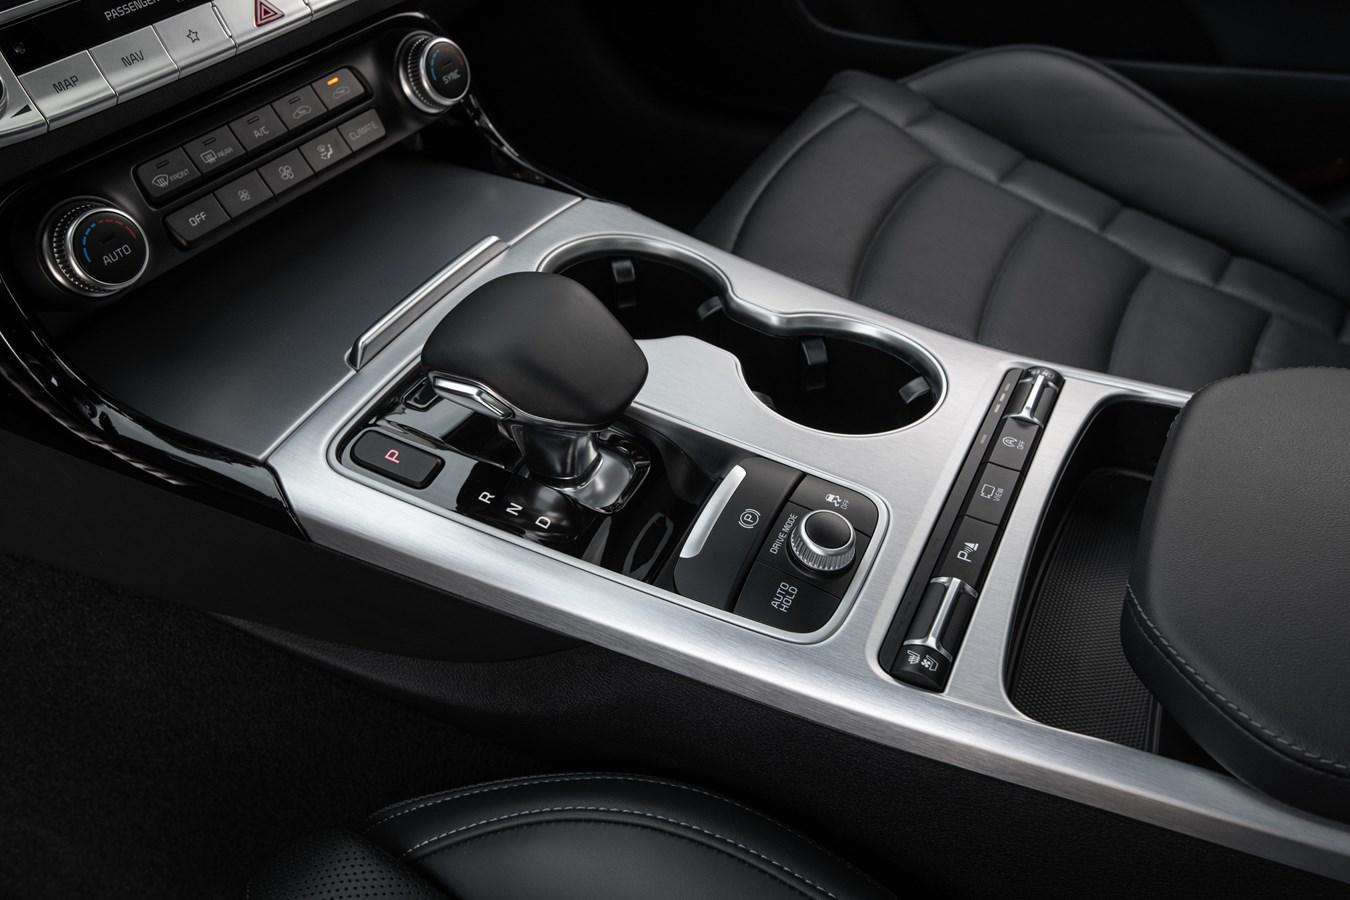 2022 Stinger GT center console gear selector